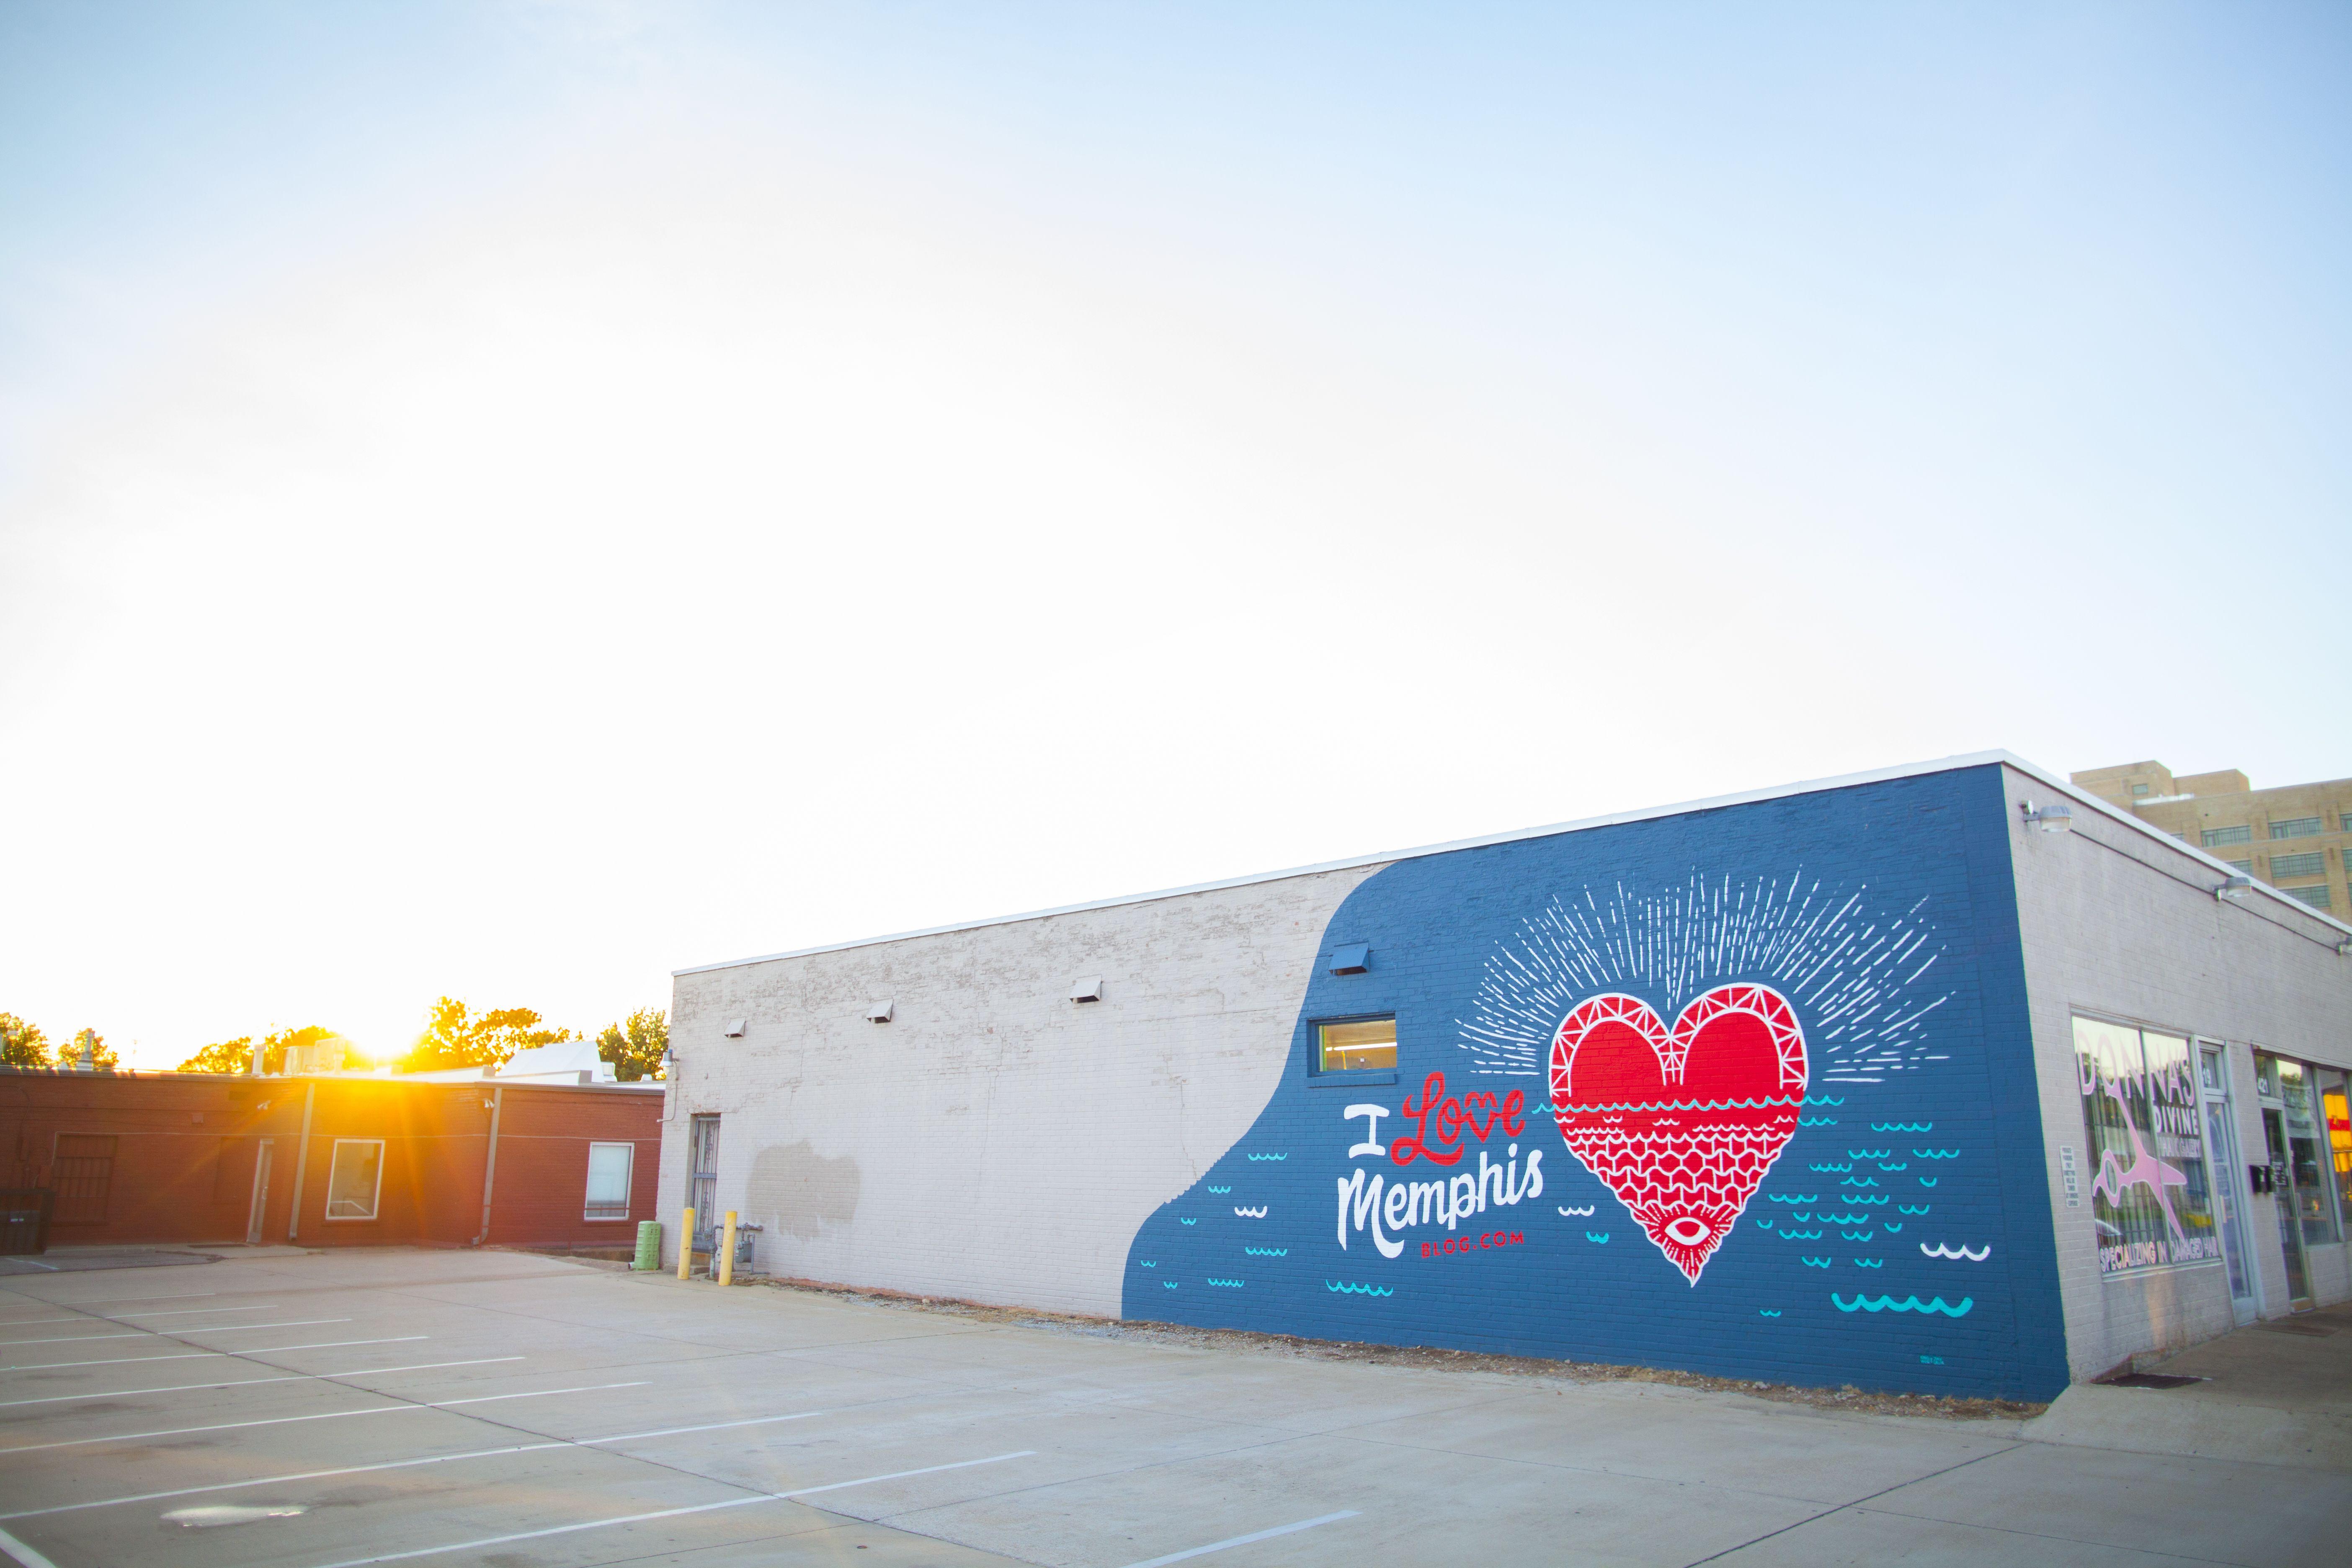 I Love Memphis mural at sunset